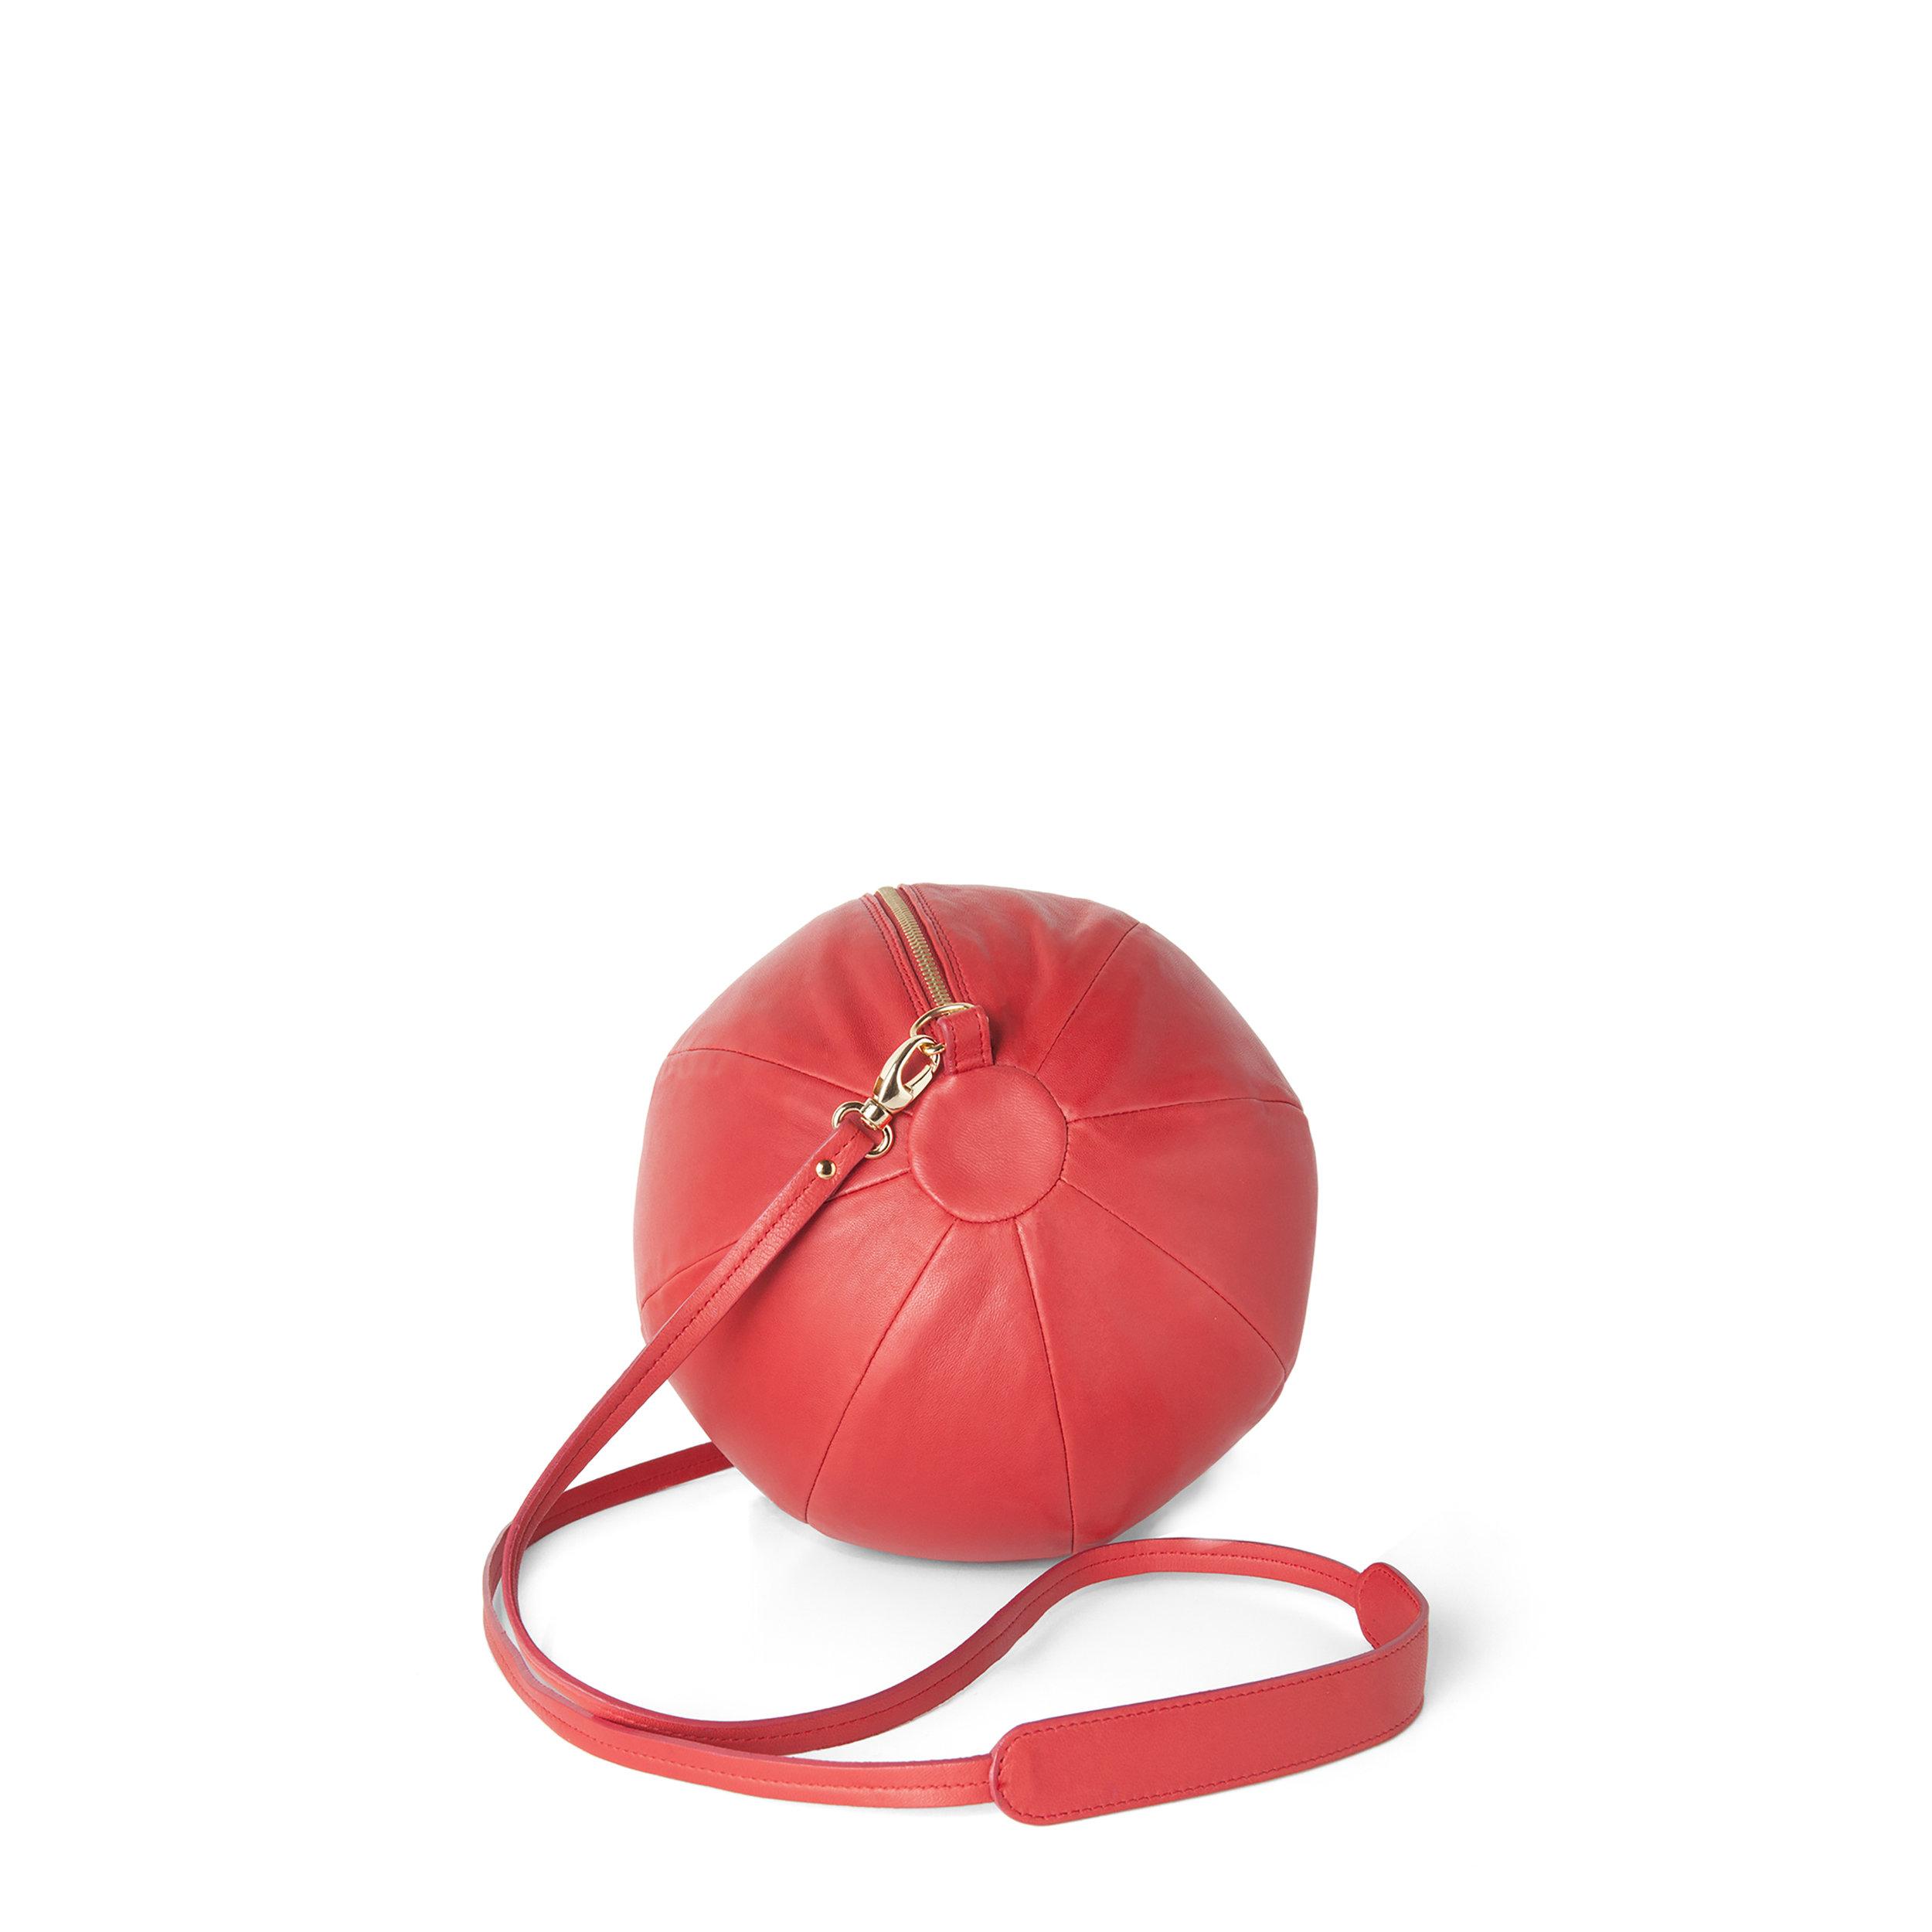 00 BALLOON red-BEA BUEHLER.jpg